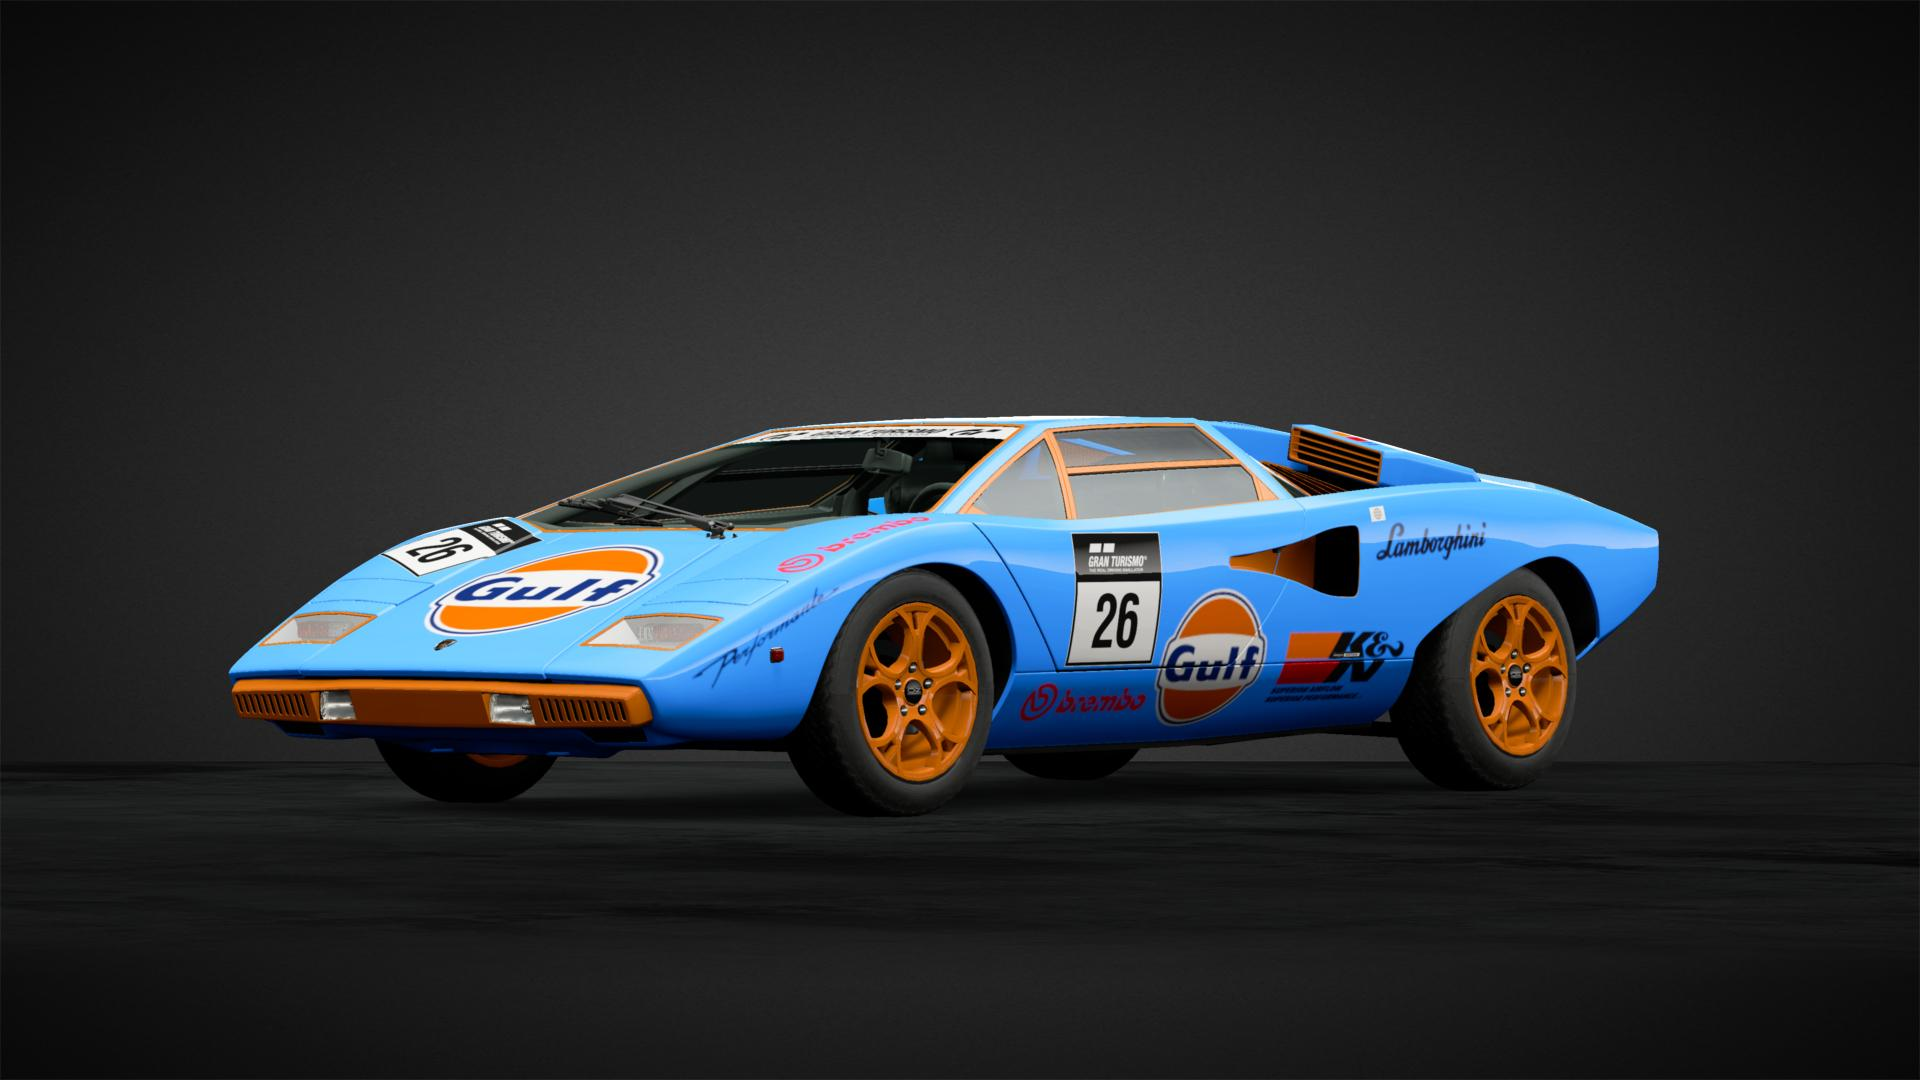 Lamborghini Countach Race Car Car Livery By Killerbiscuit